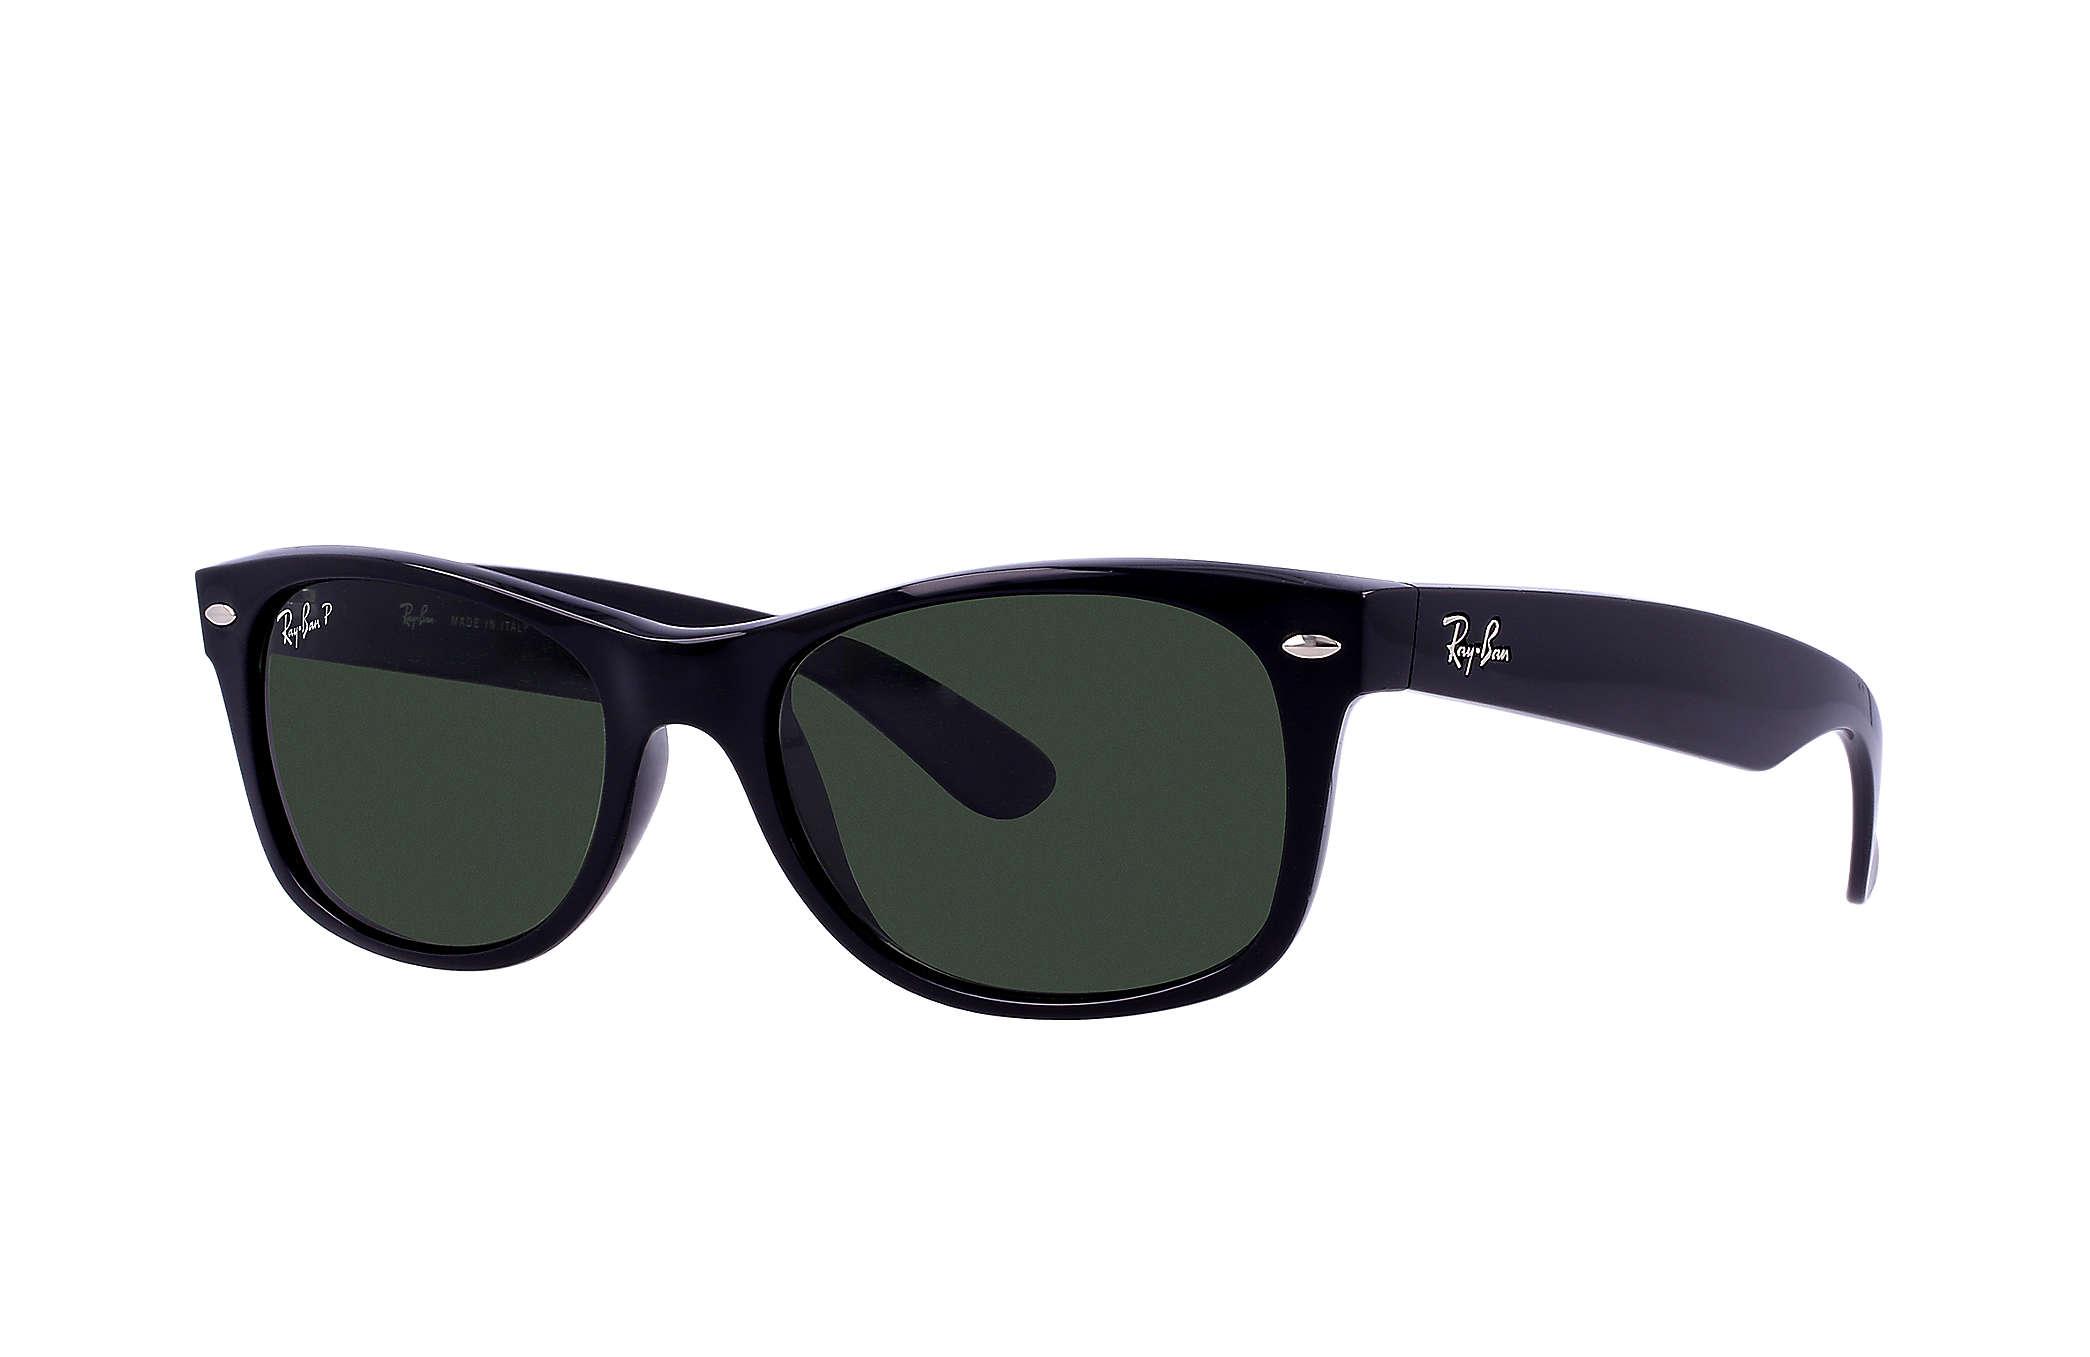 123a8efbd3 Ray-Ban New Wayfarer Classic RB2132 Black - Nylon - Green Polarized ...